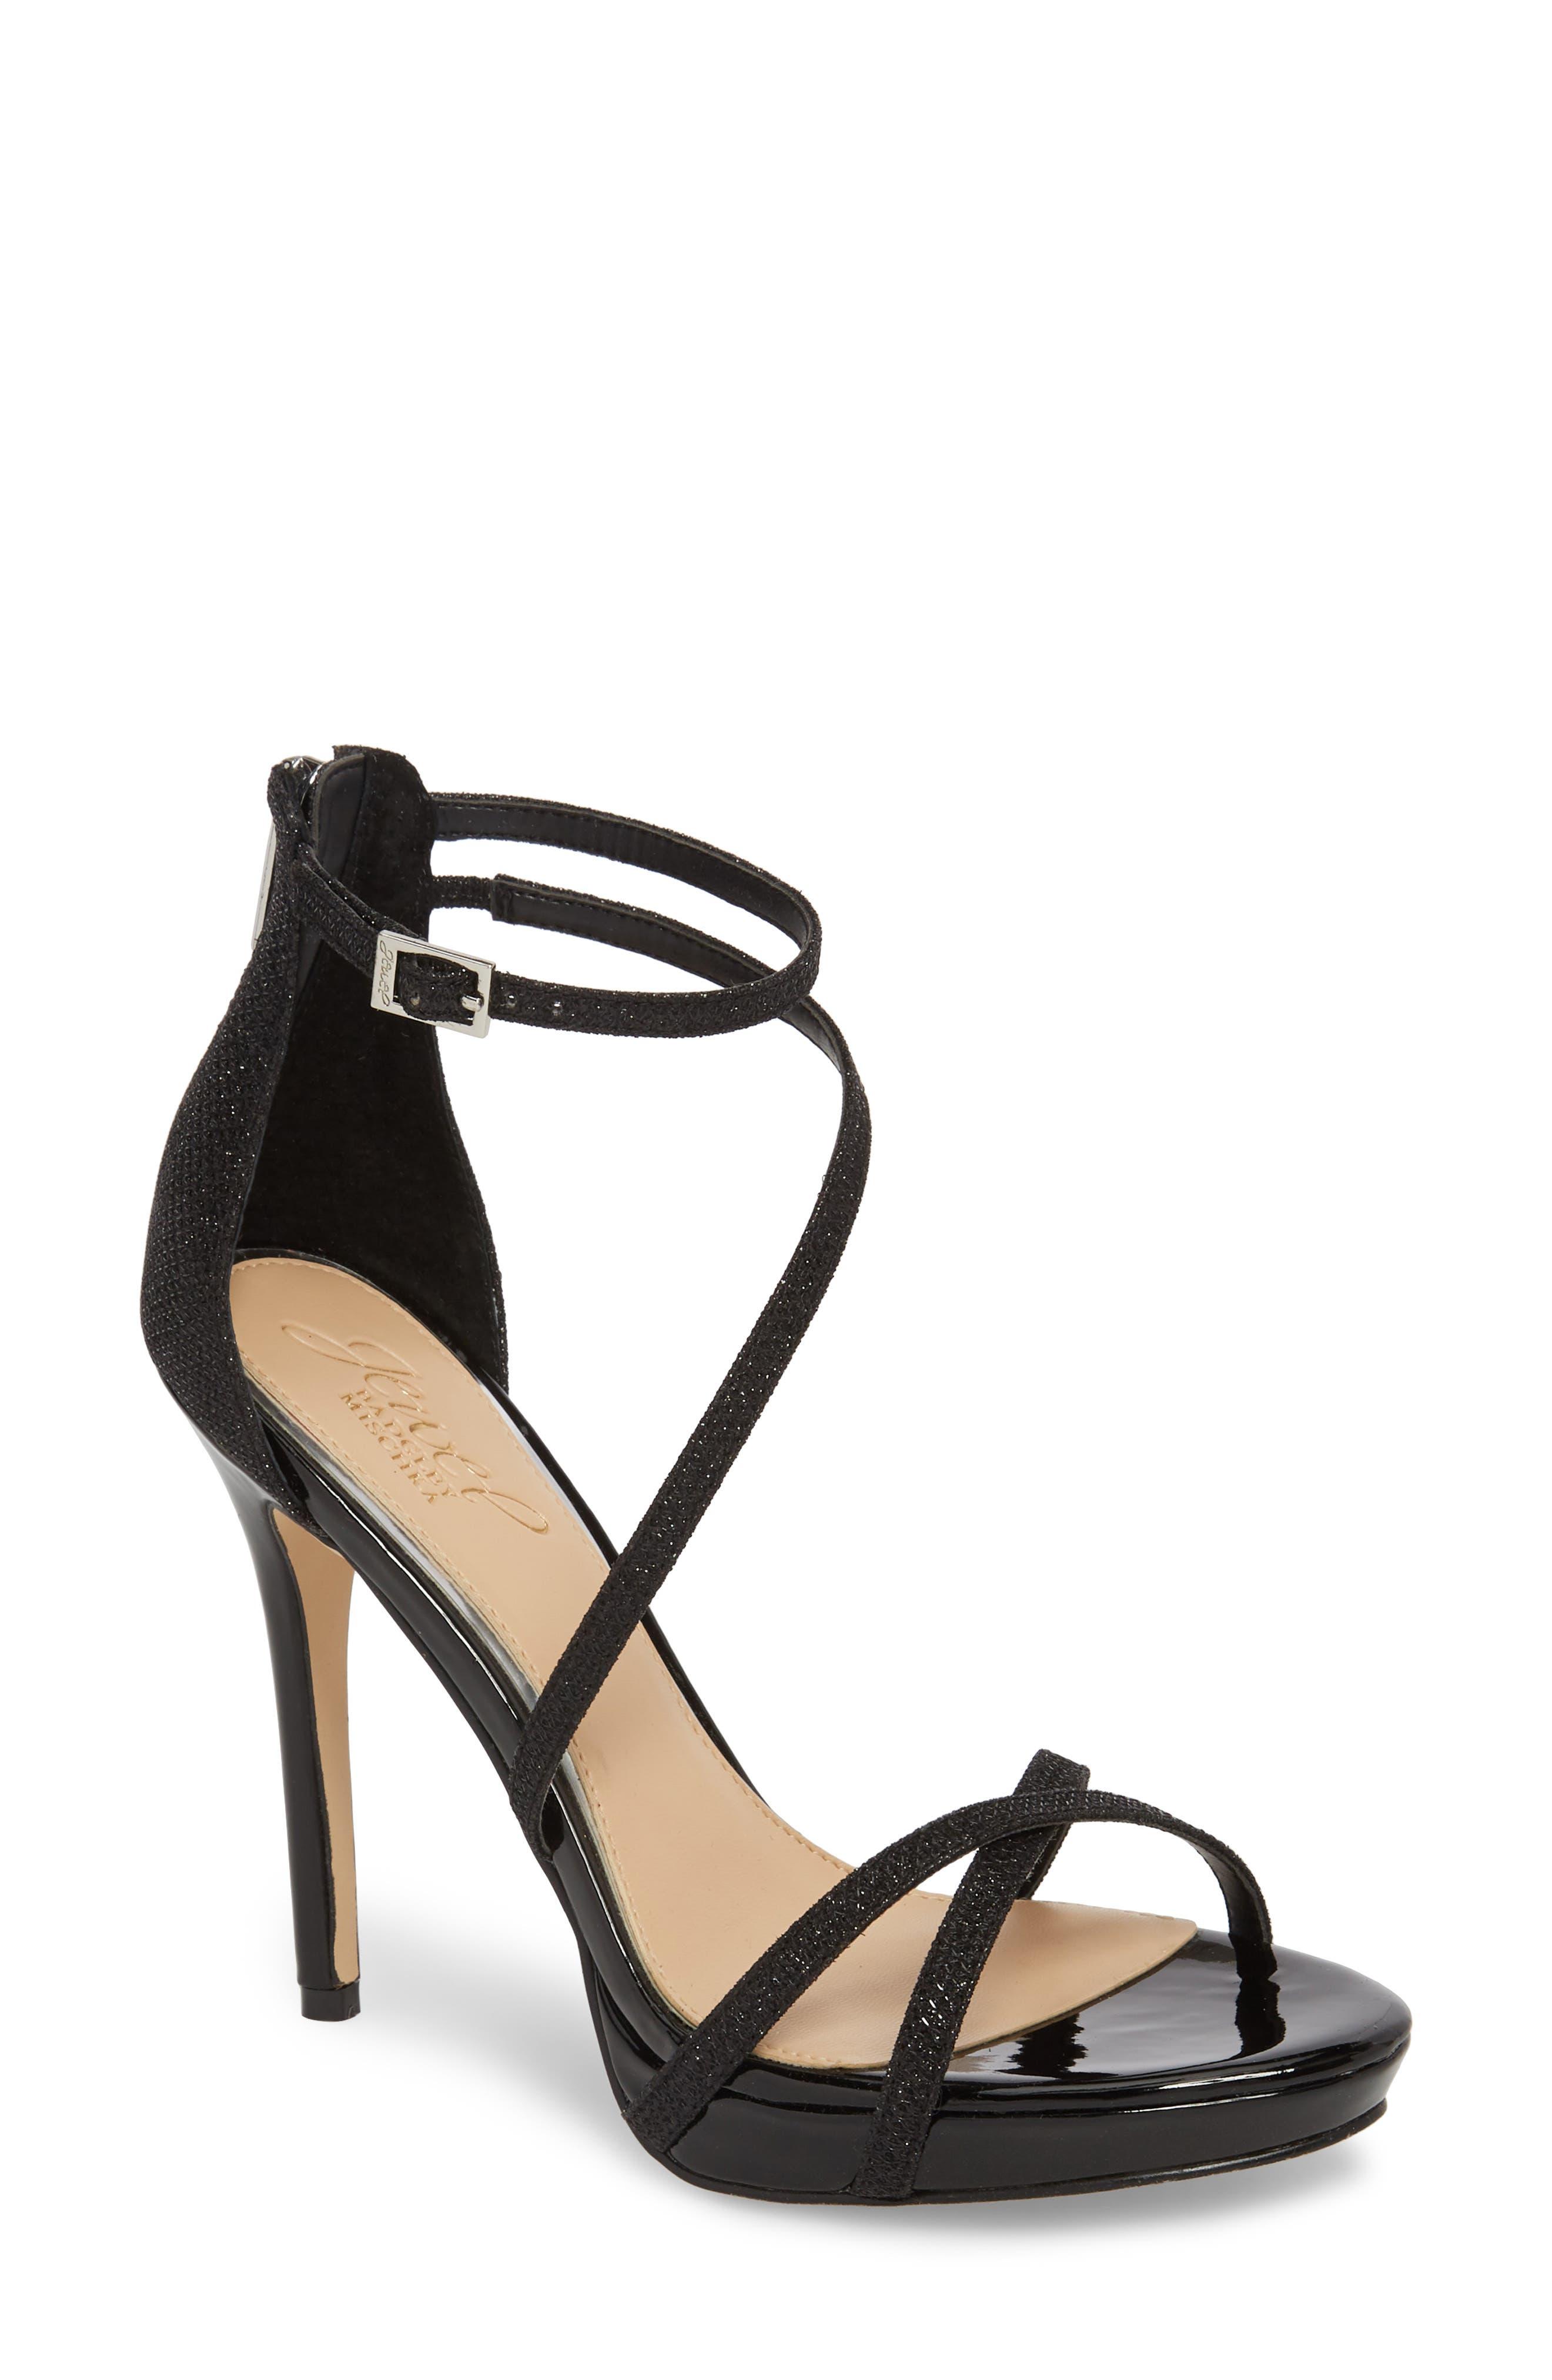 JEWEL BADGLEY MISCHKA, Galen Strappy Platform Sandal, Main thumbnail 1, color, BLACK GLITTER FABRIC